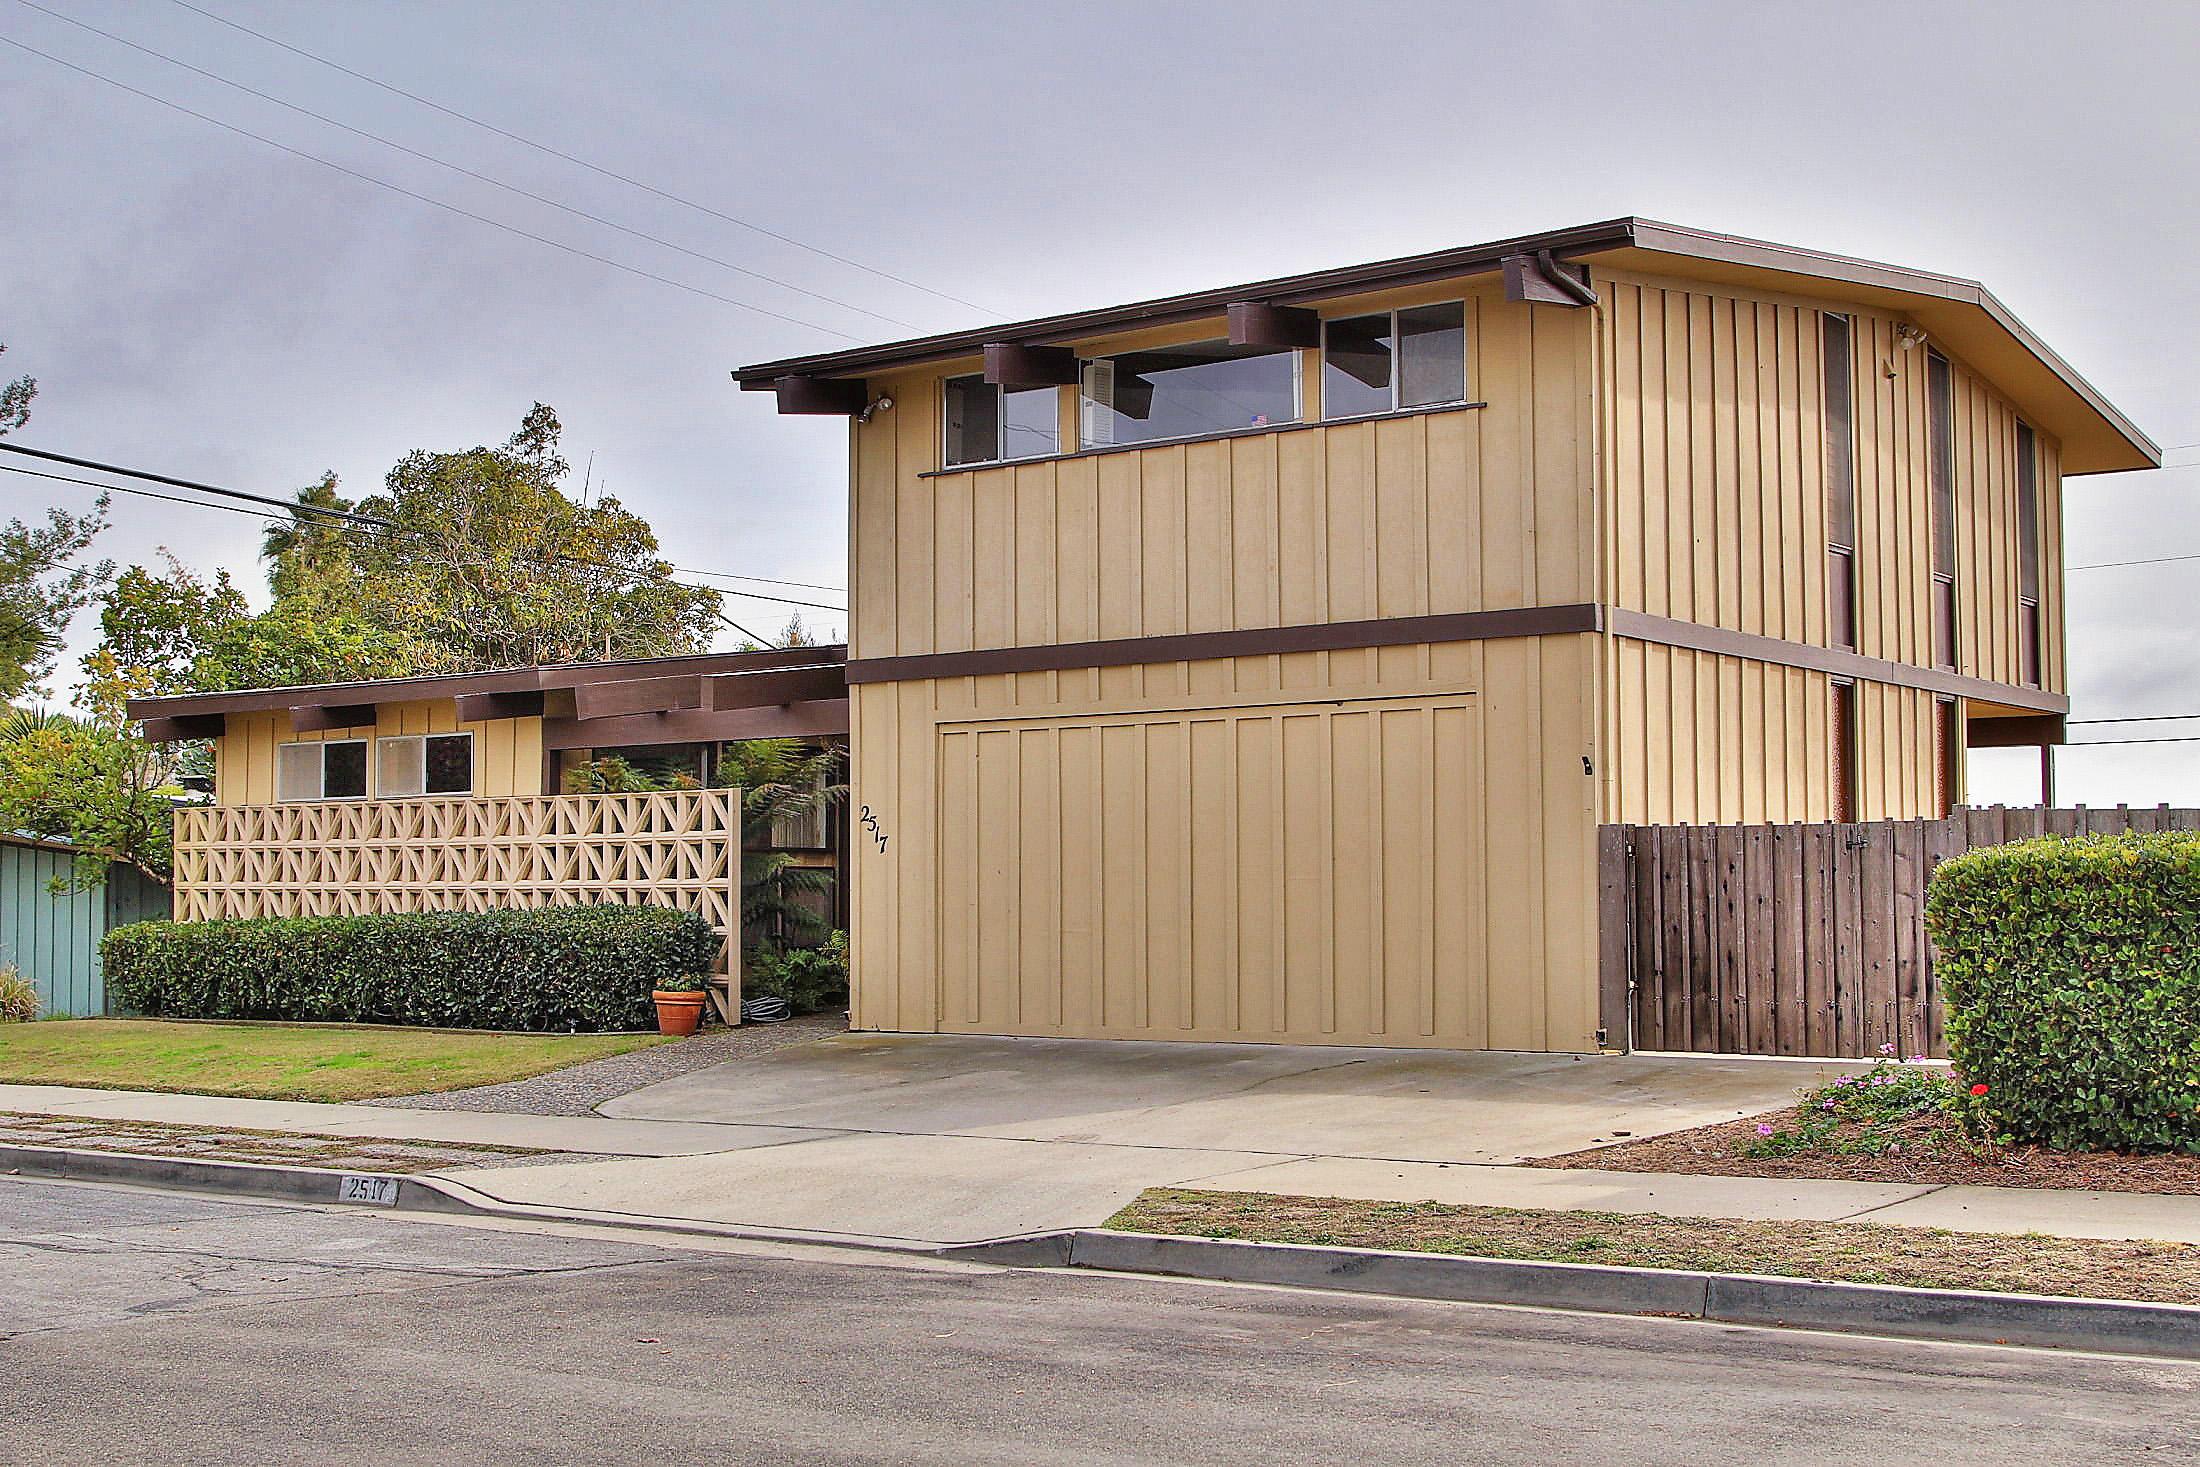 Property photo for 2517 Selrose Ln Santa Barbara, California 93109 - 16-181